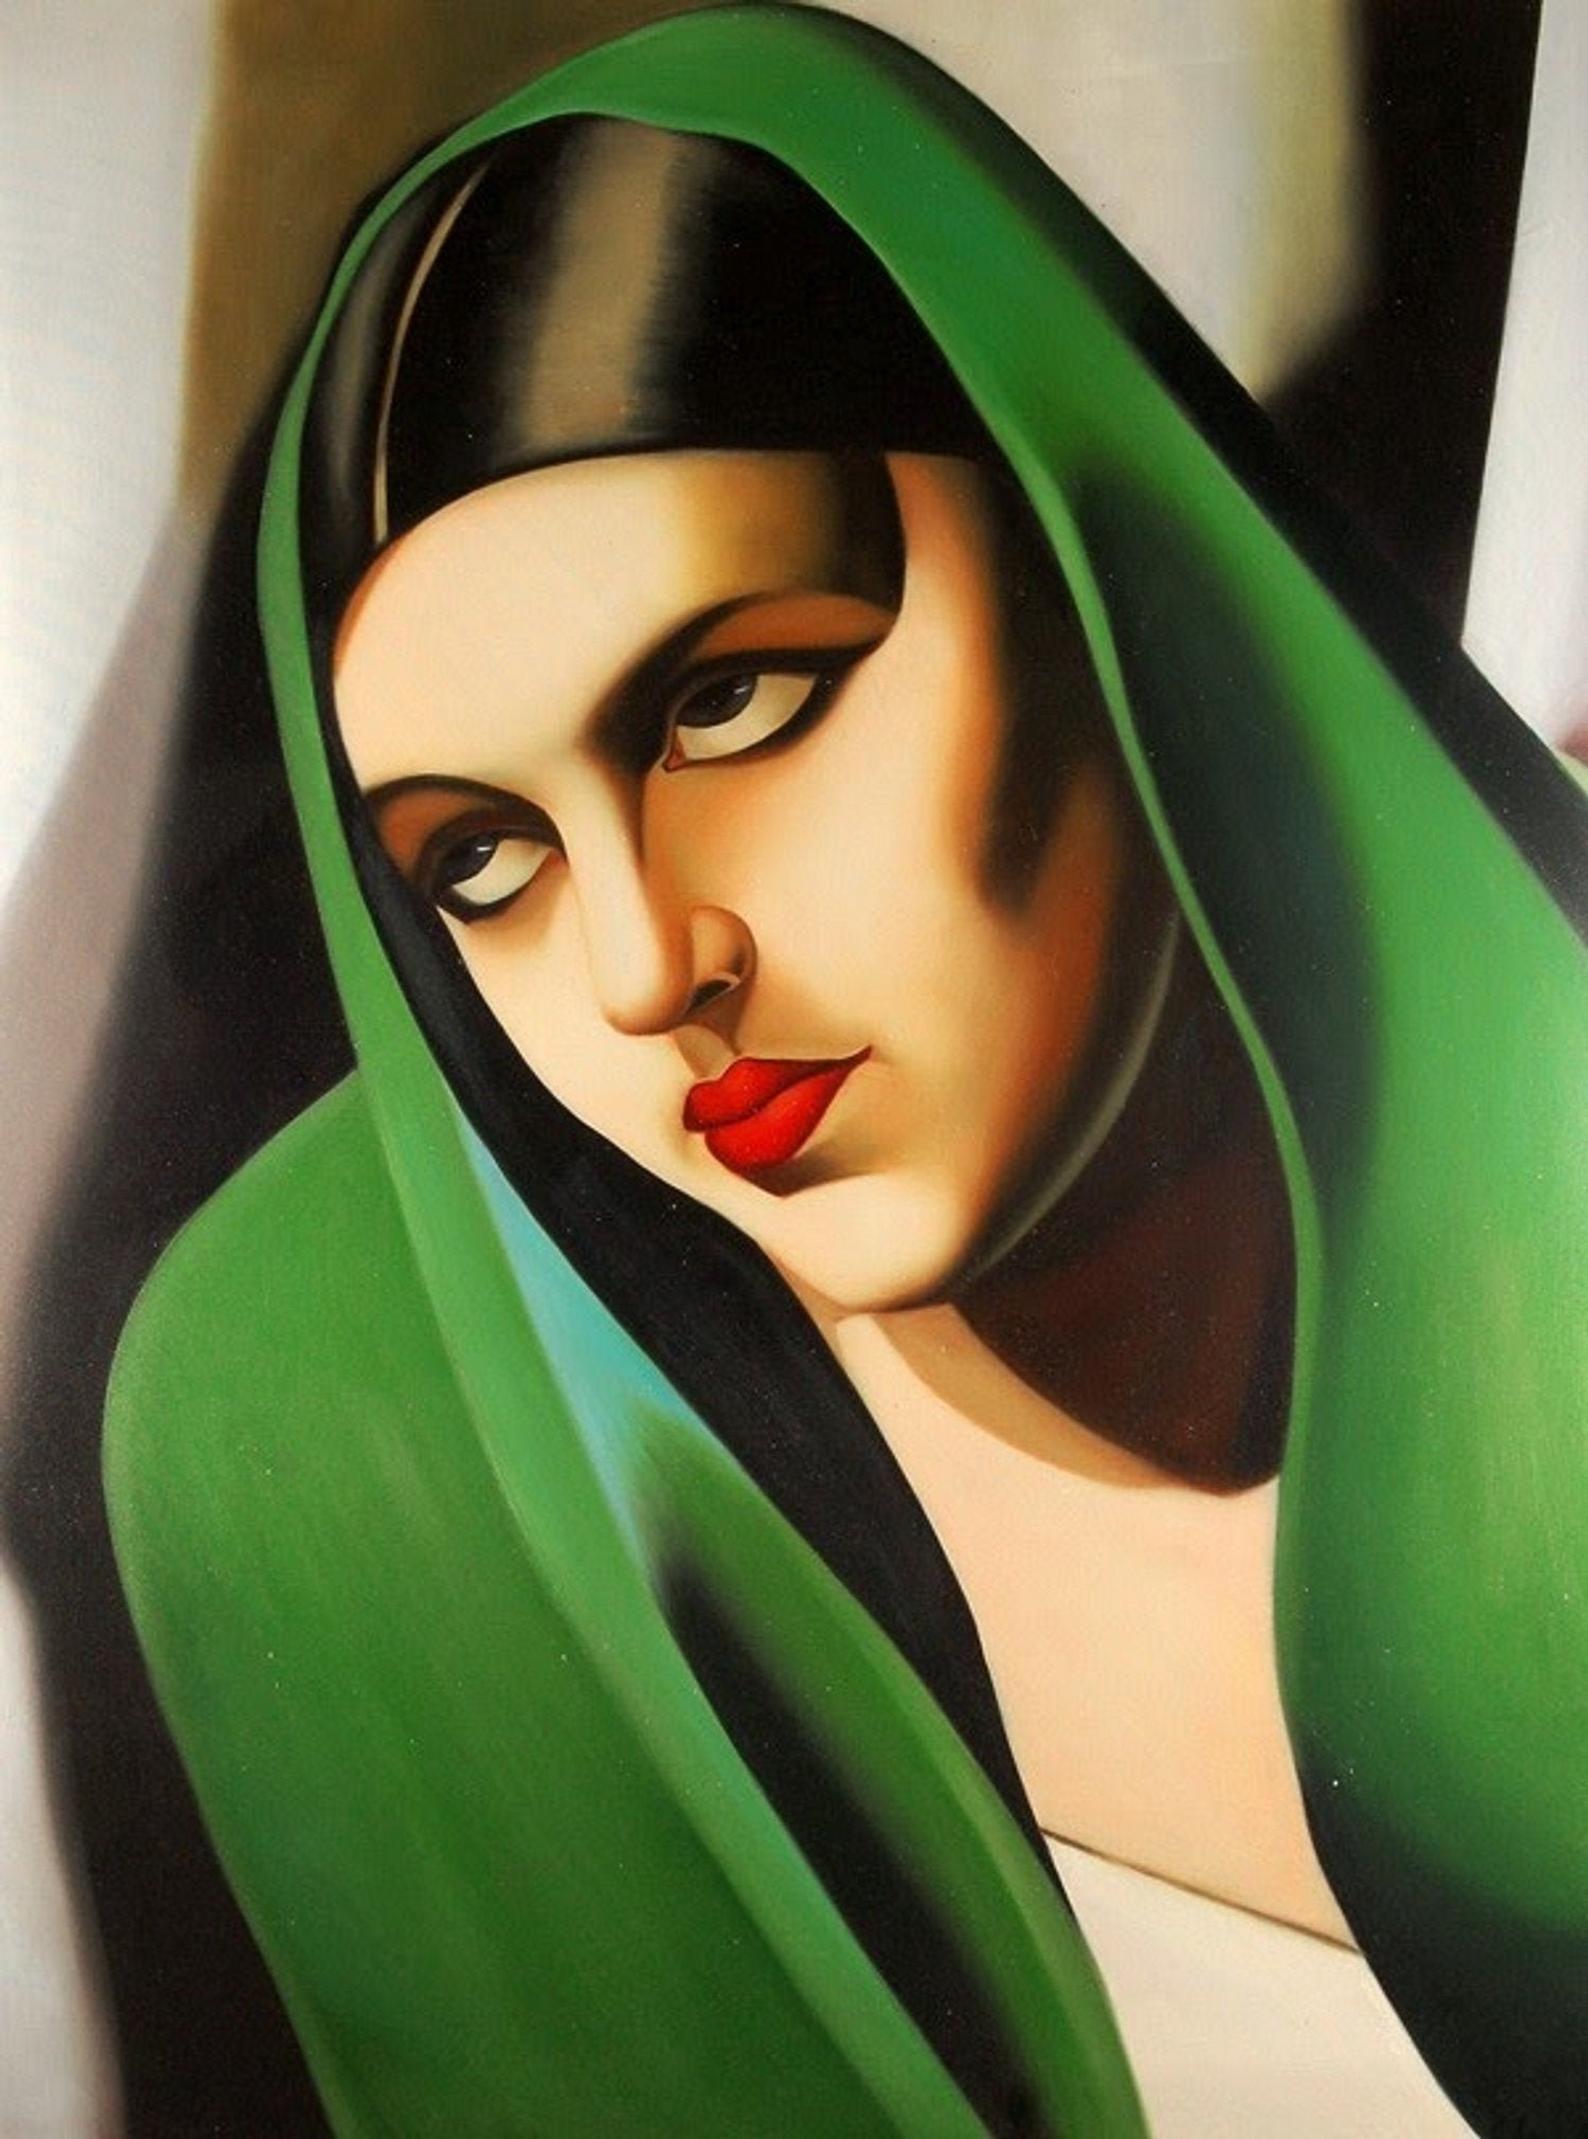 Le voile vert, Tamara de Lempicka, 1925